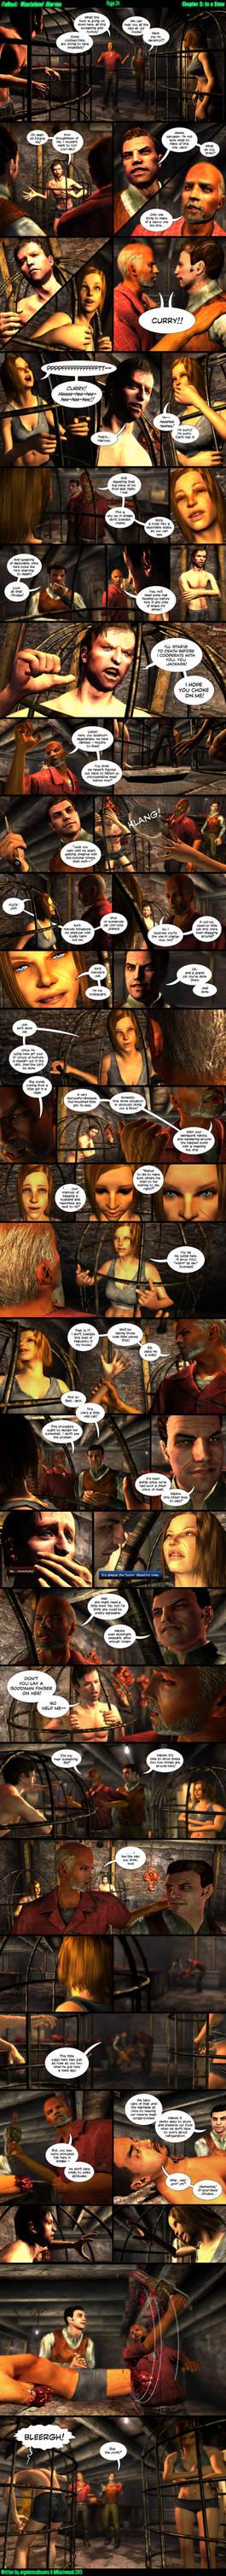 Wasteland Diaries - Page 24